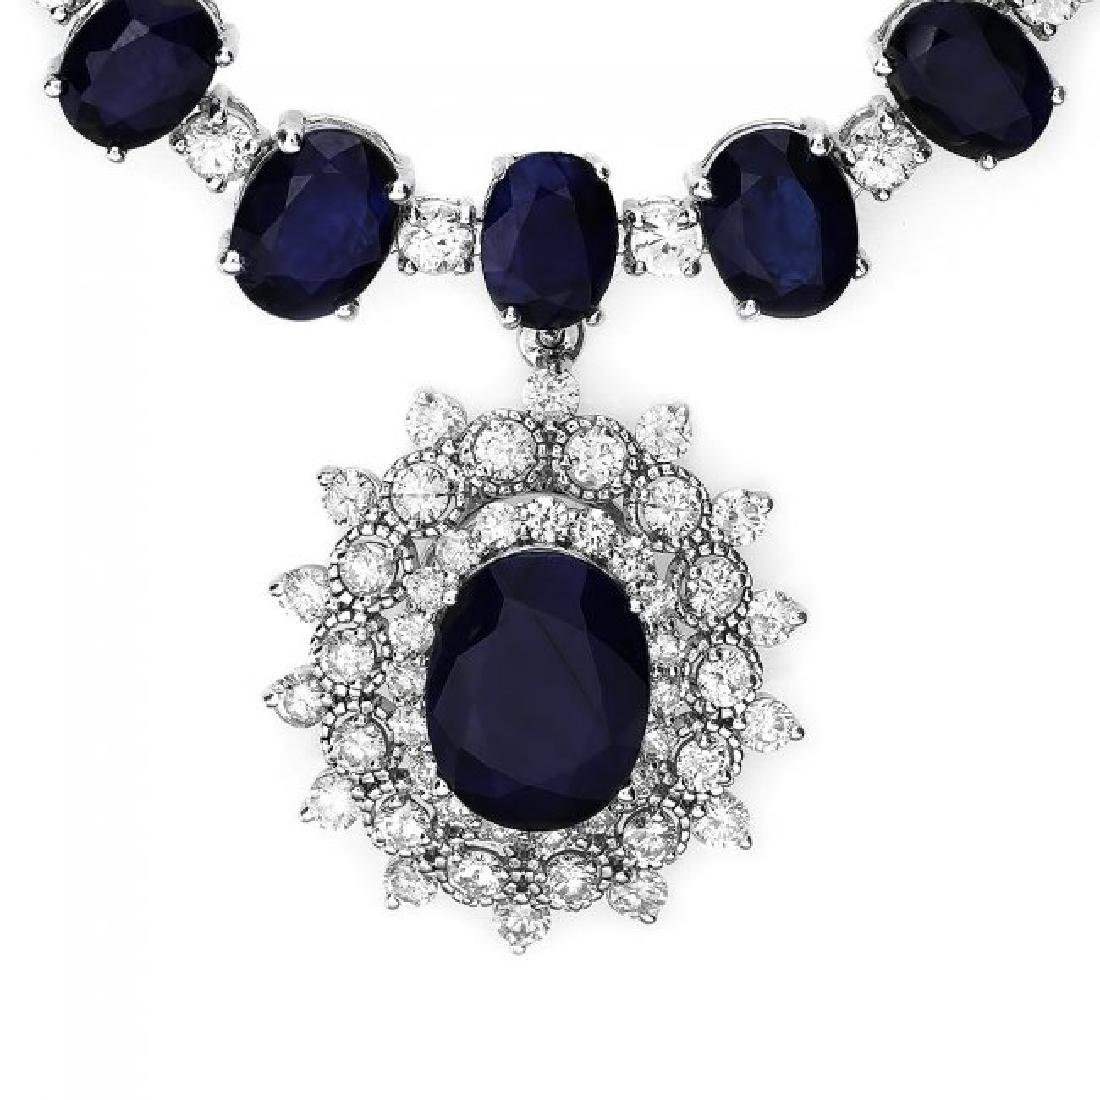 14k Gold 86ct Sapphire 2.50ct Diamond Necklace - 2